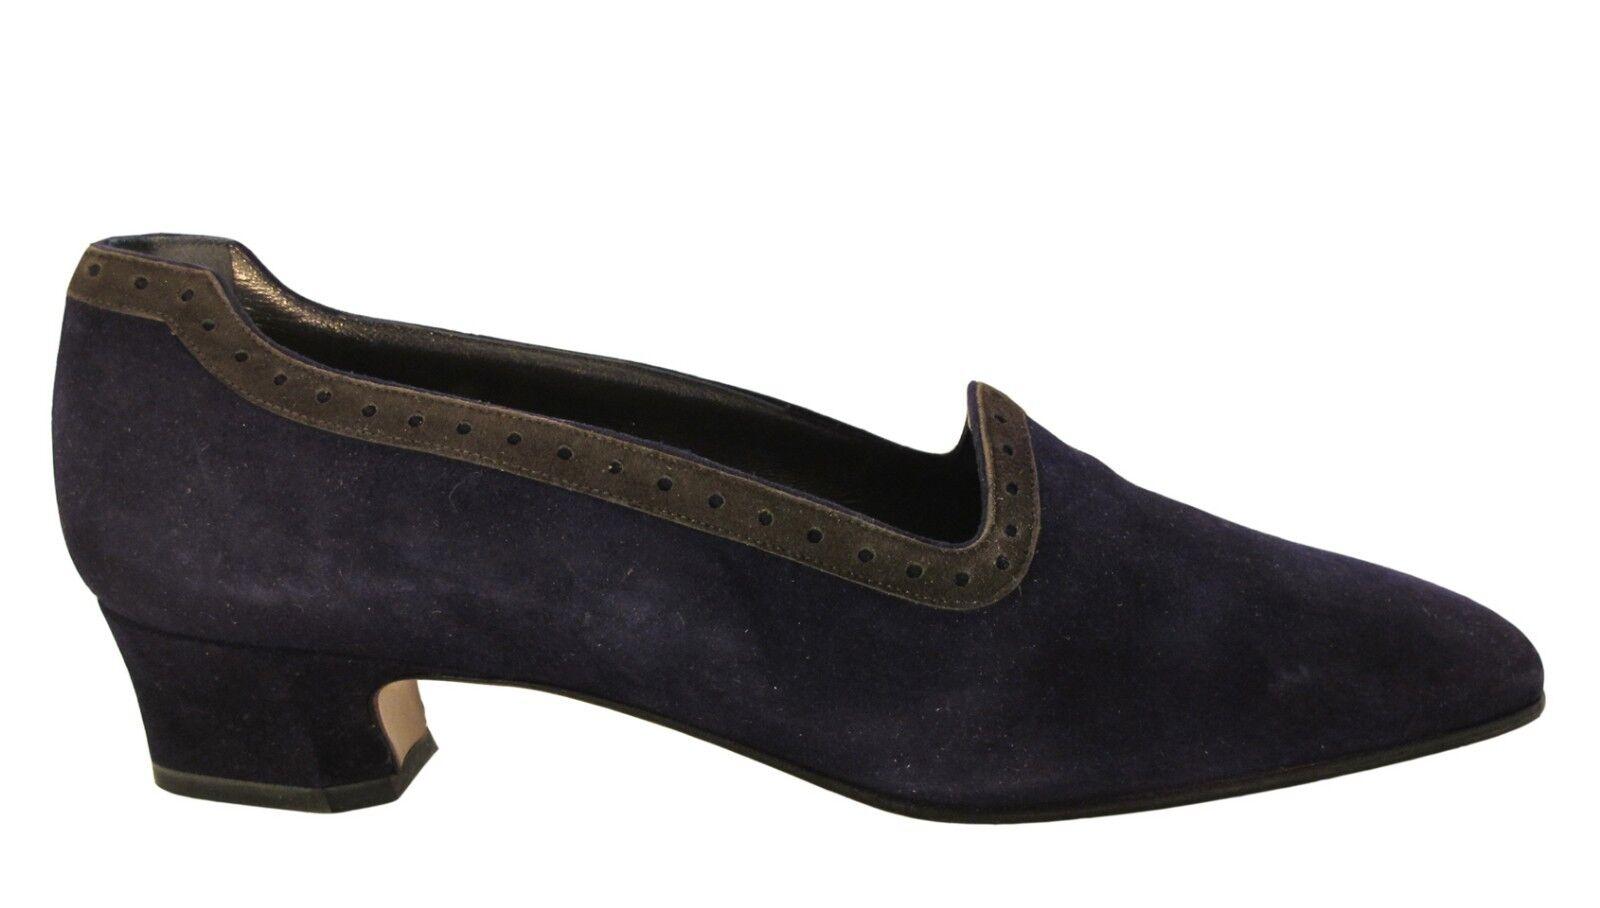 Mima Venezia Women's Italian 630 Slip on Shoes Low Heel Suede Purple/Grey